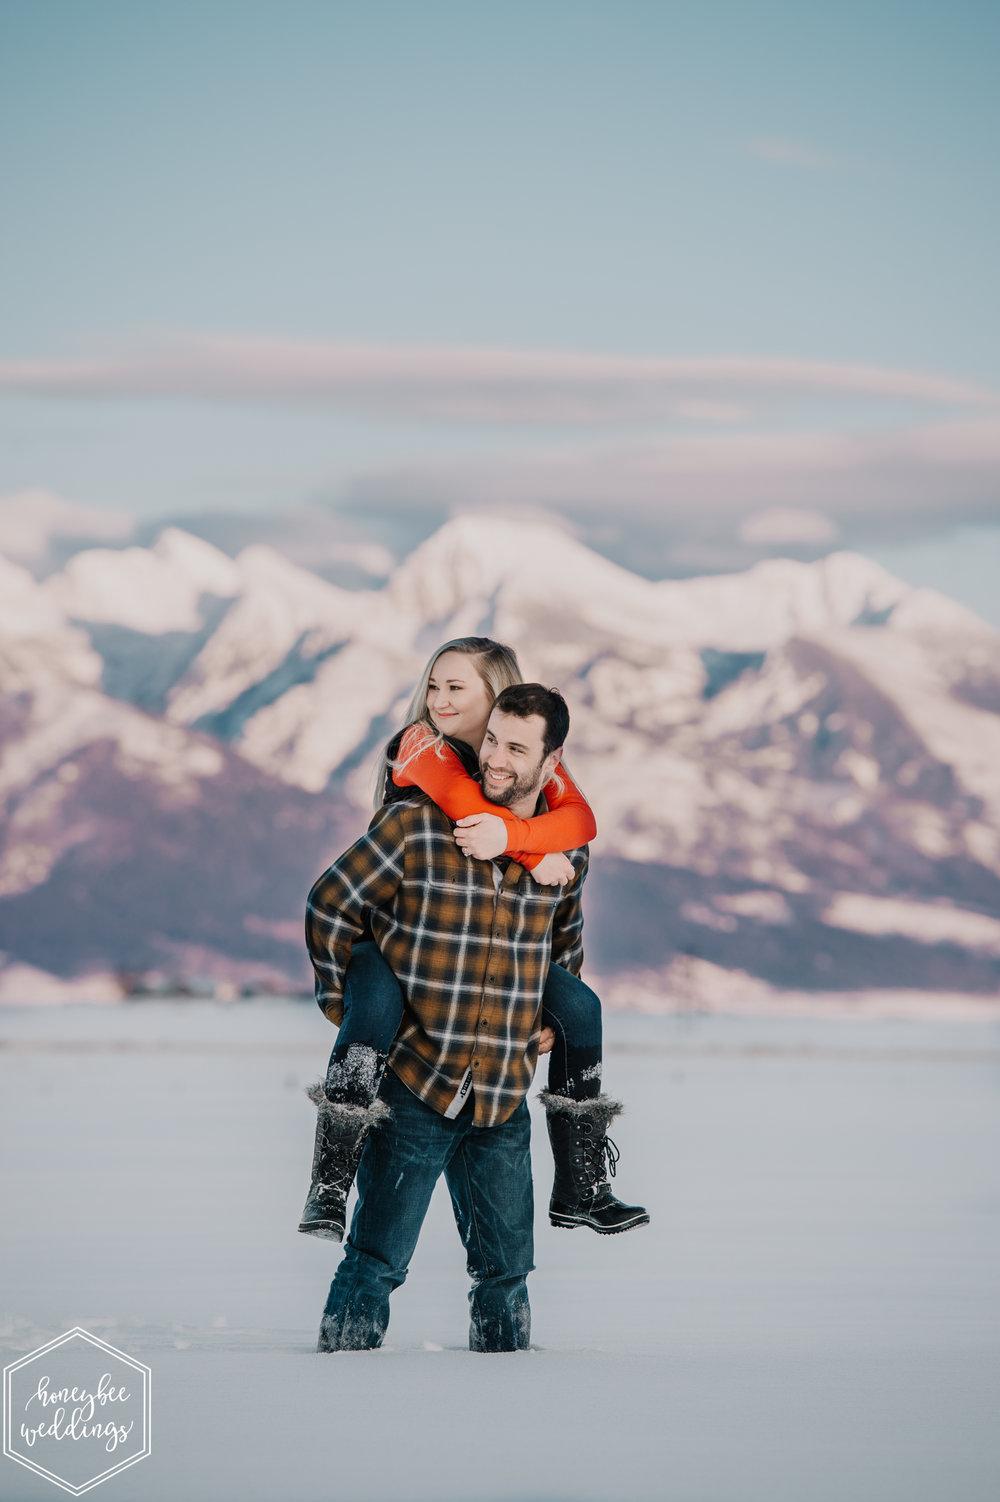 059Montana Wedding Photographer_Winter Engagement_Polson_Jessica & Brian_March 09, 2019-97.jpg